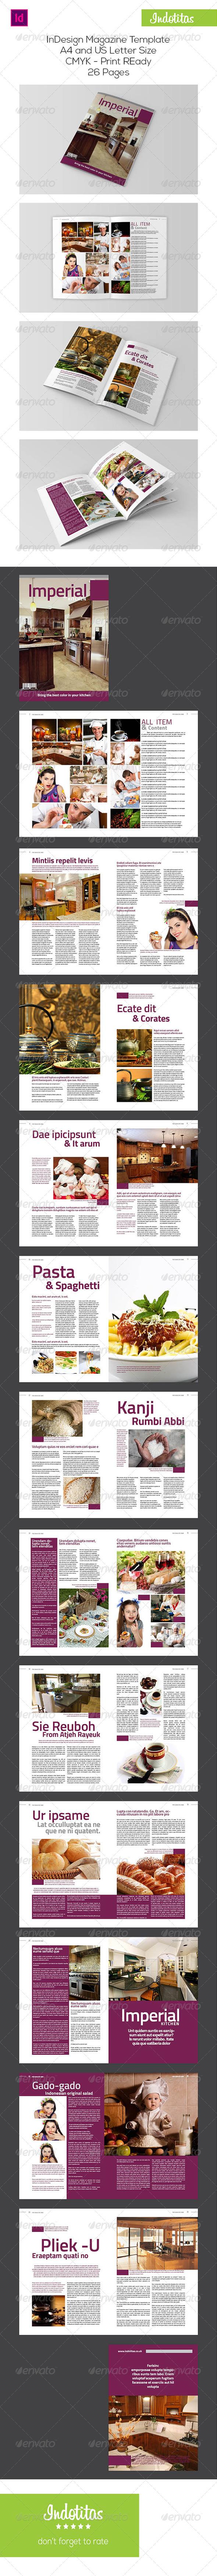 GraphicRiver Kitchen InDesign Magazine Template 7283396